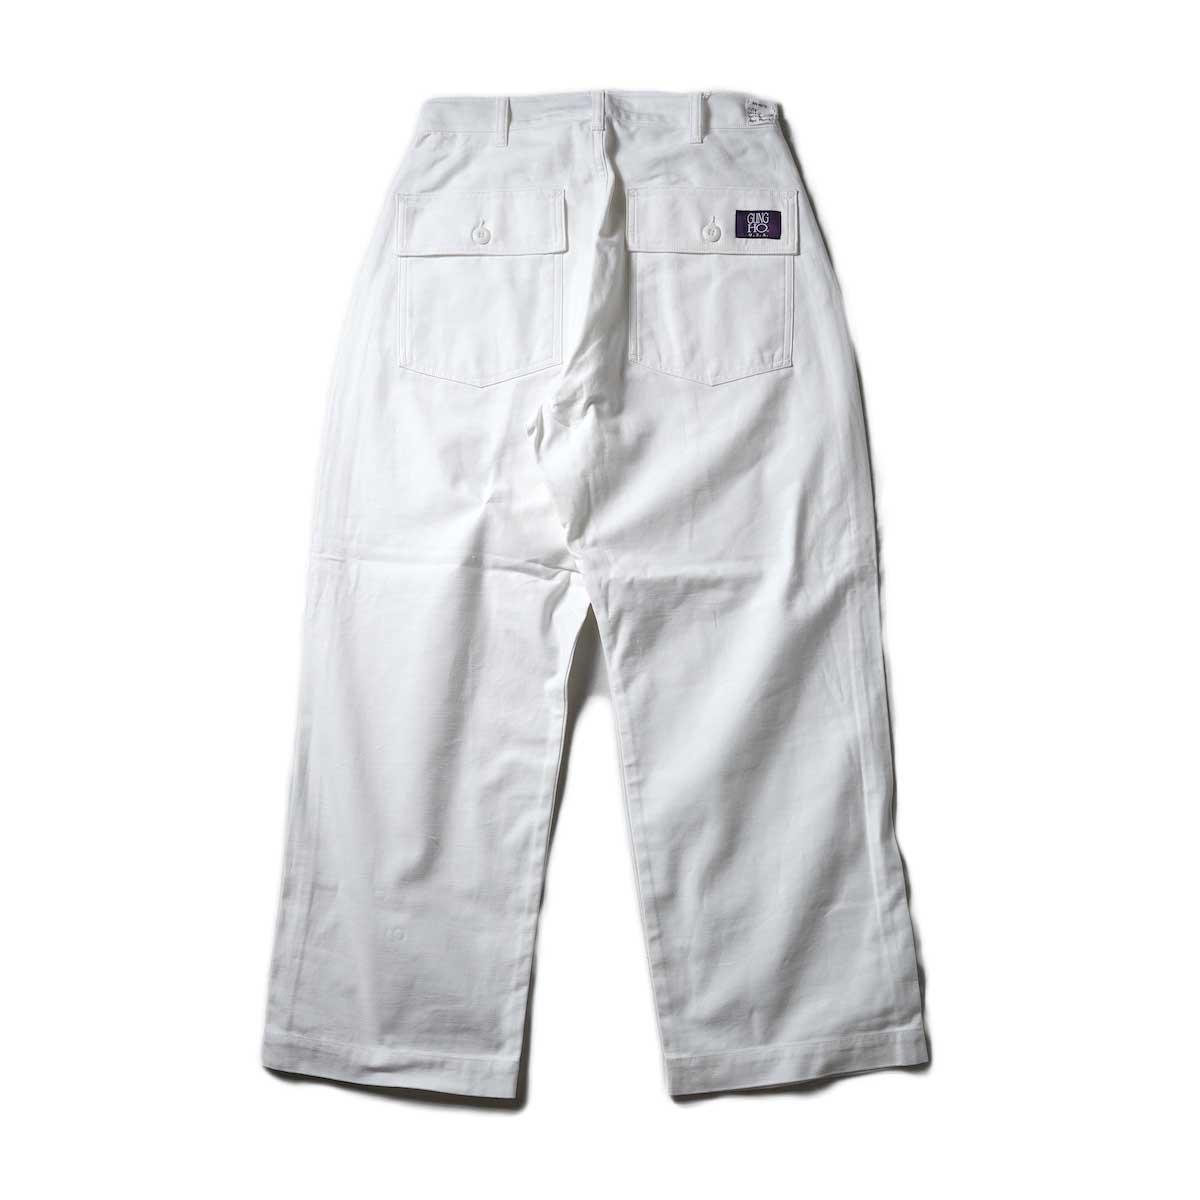 UNIVERSAL PRODUCTS / Gung Ho 1tuck Baker Pants (Ivory)背面